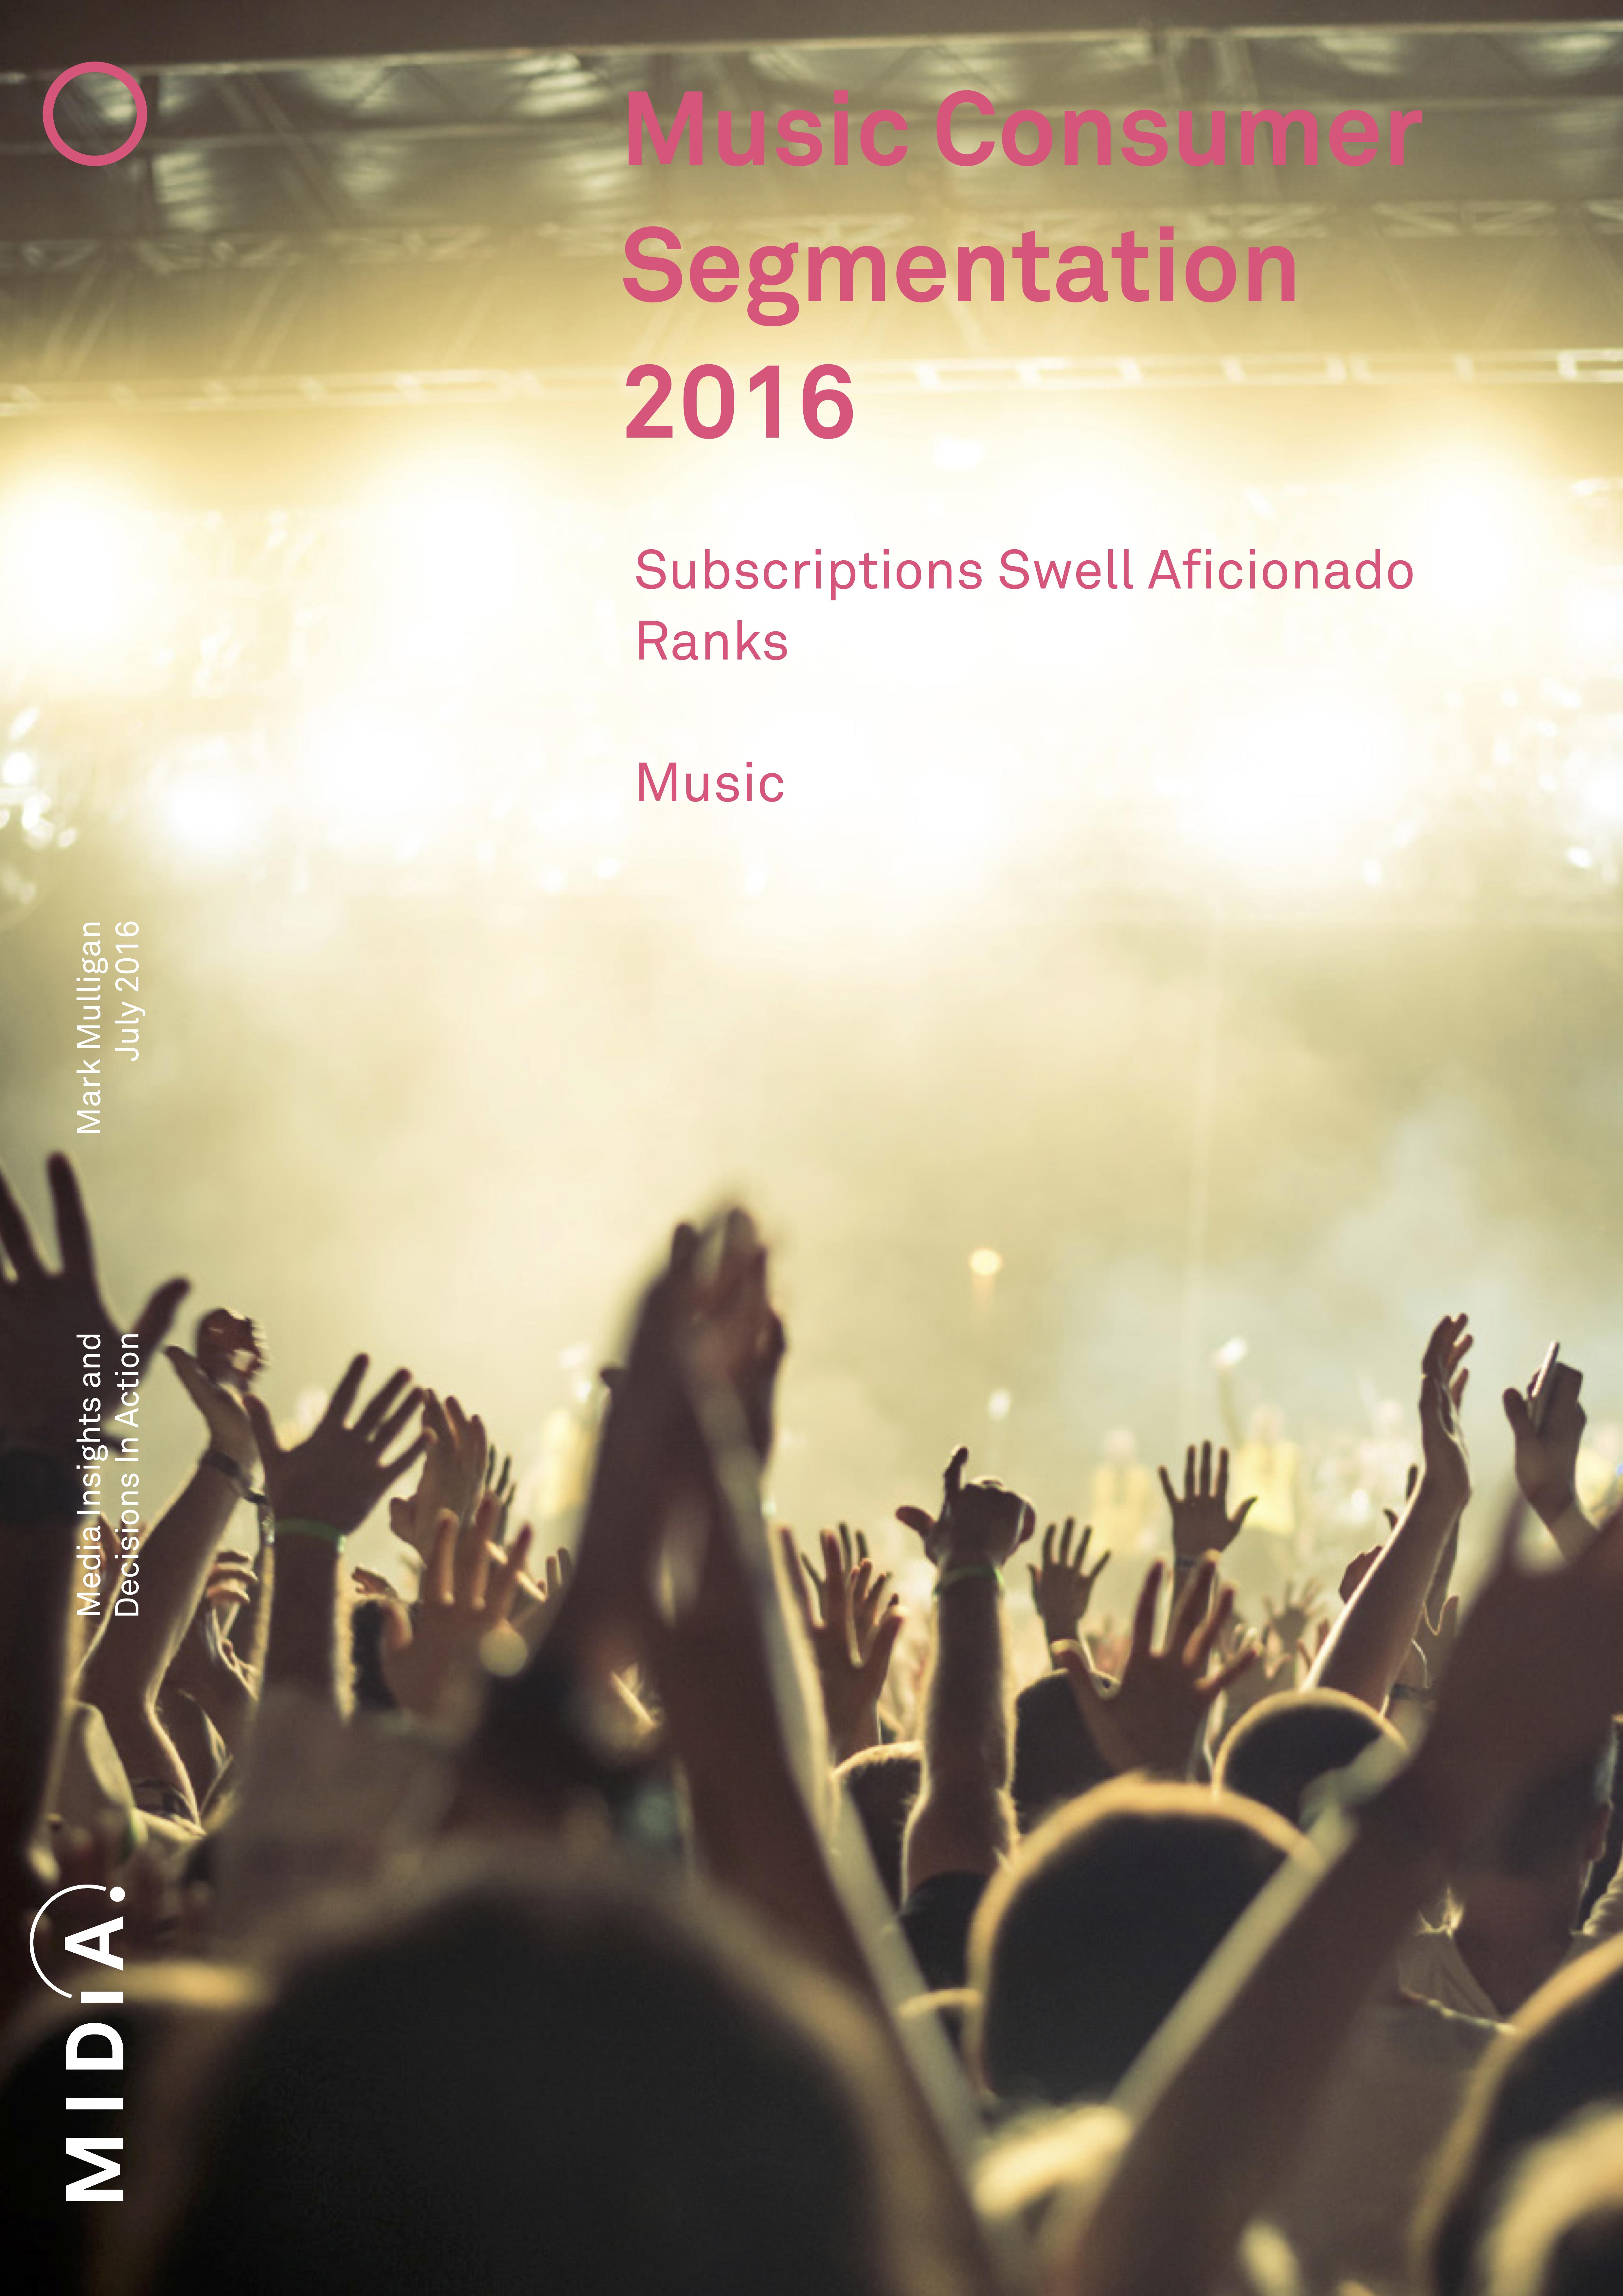 Cover image for Music Consumer Segmentation 2016